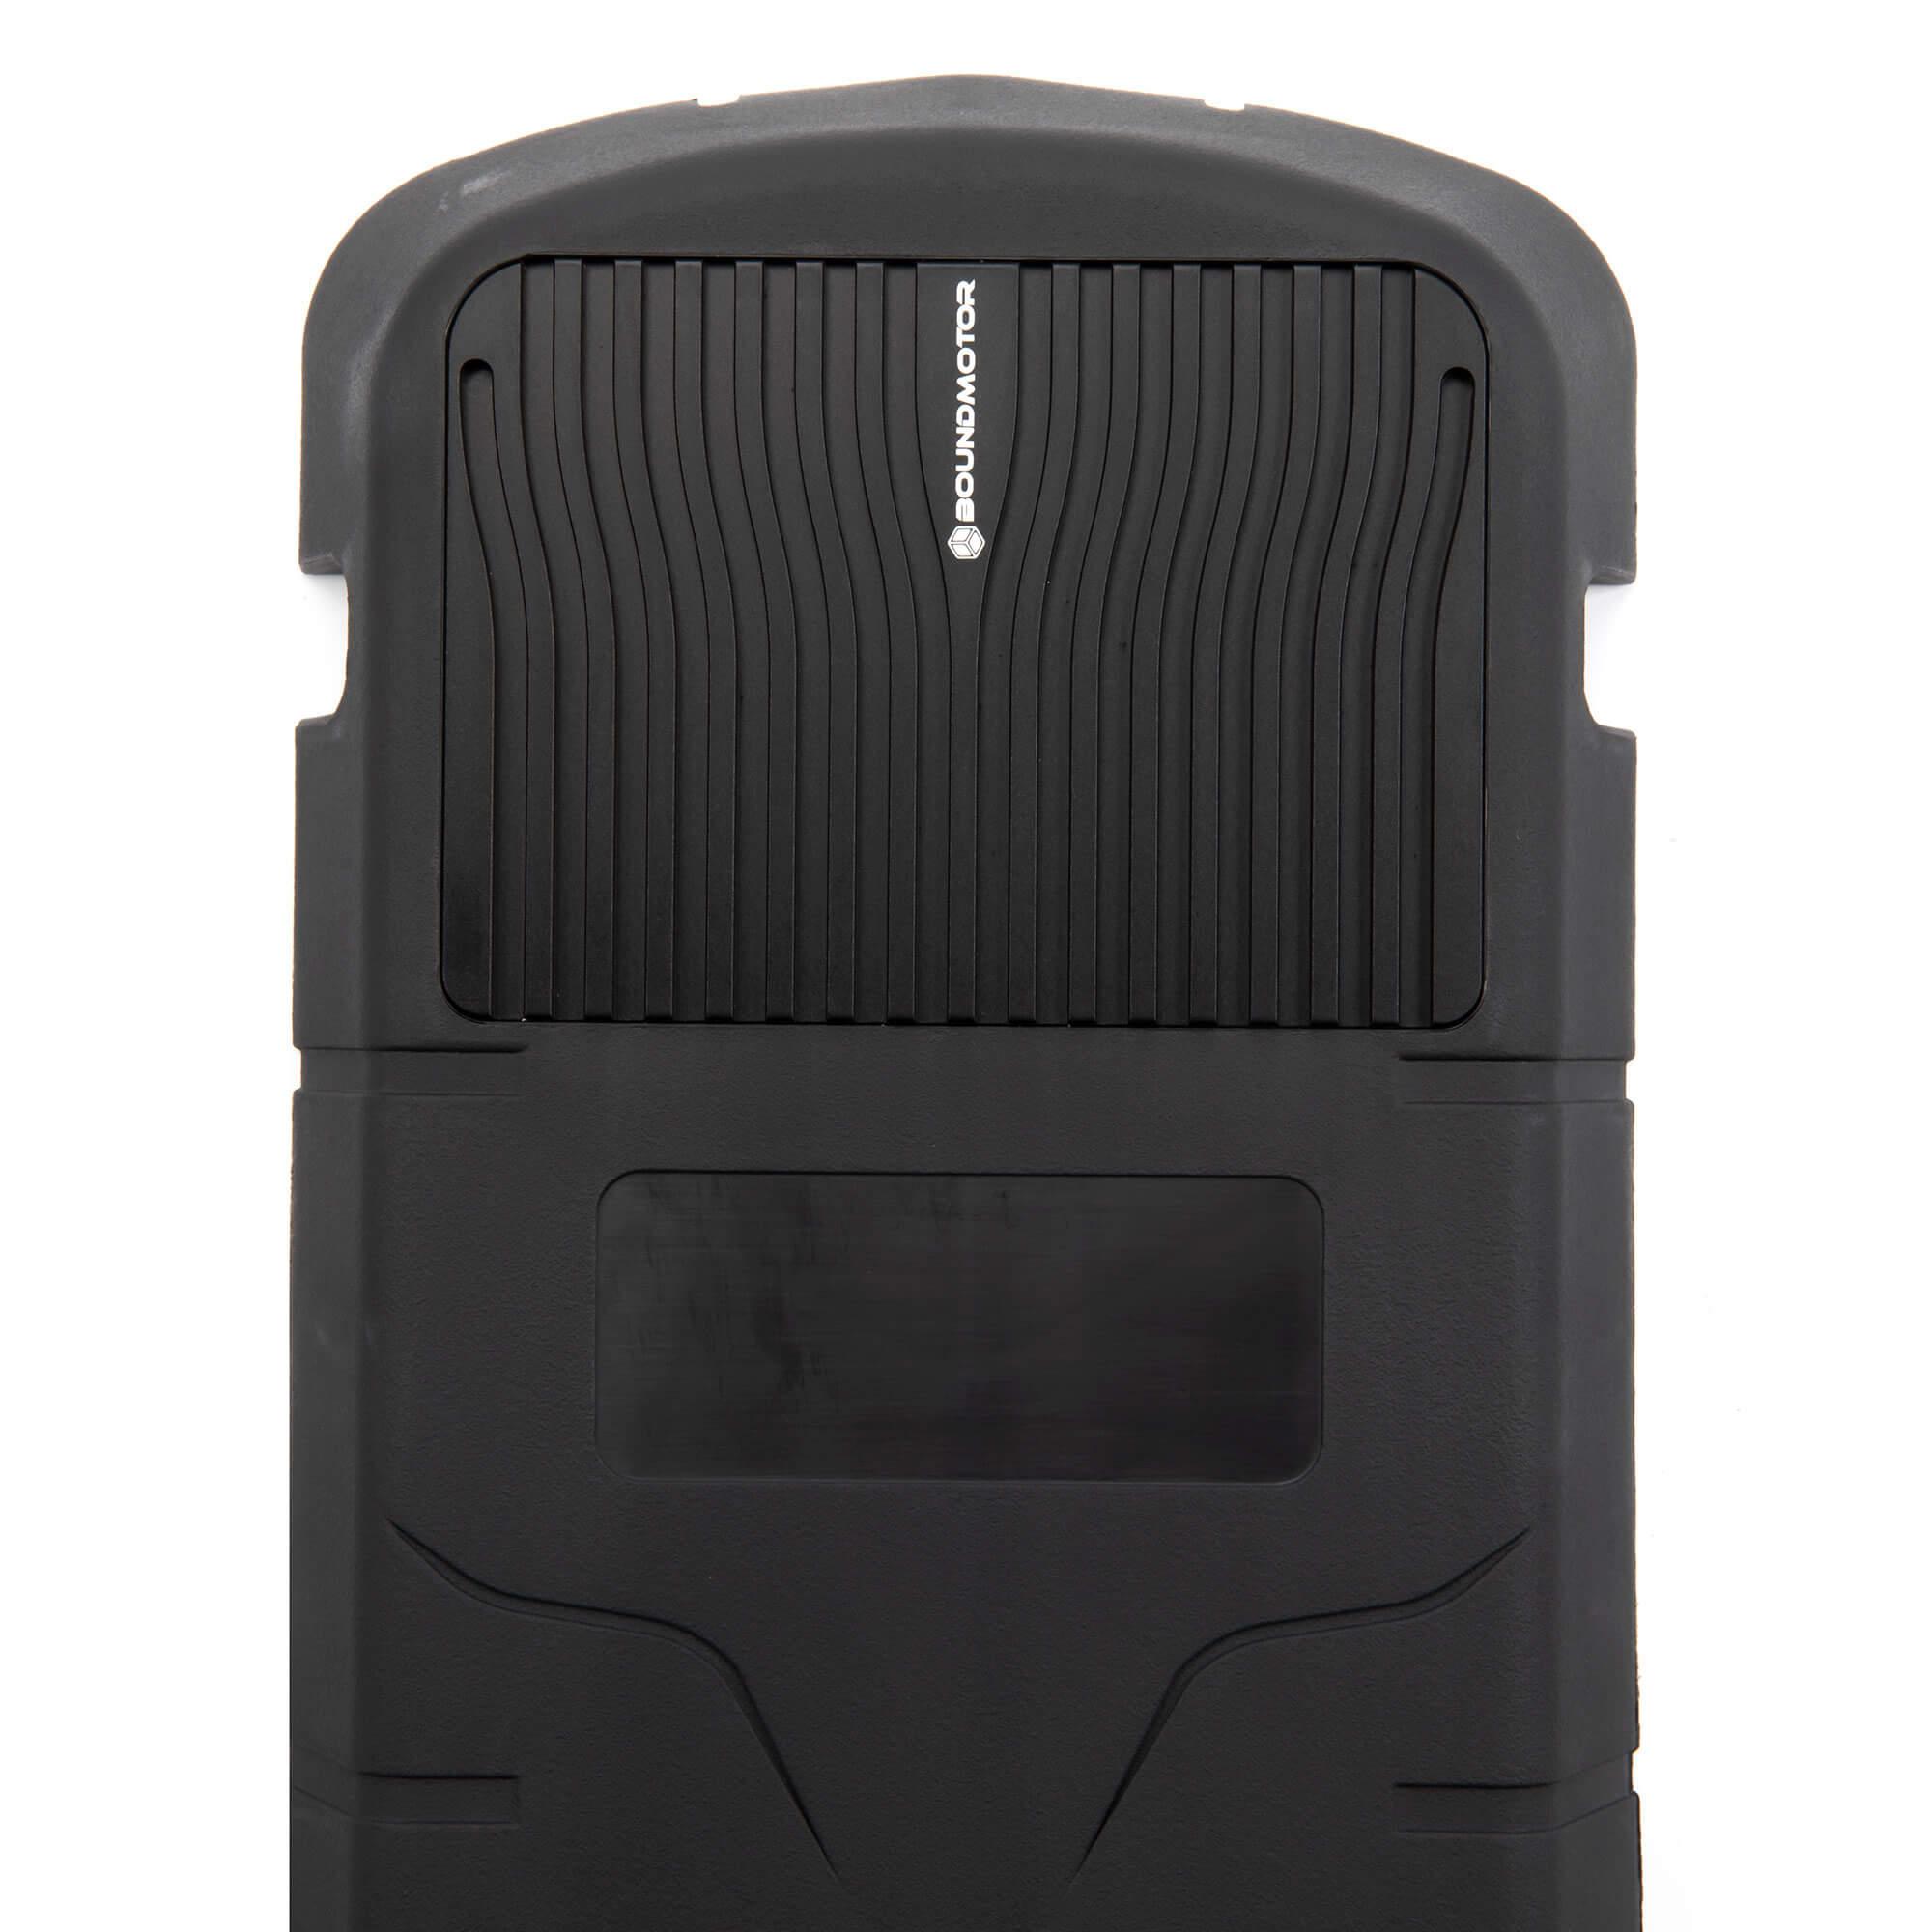 Battery Enclosure/Case for DIY Electric Skateboard